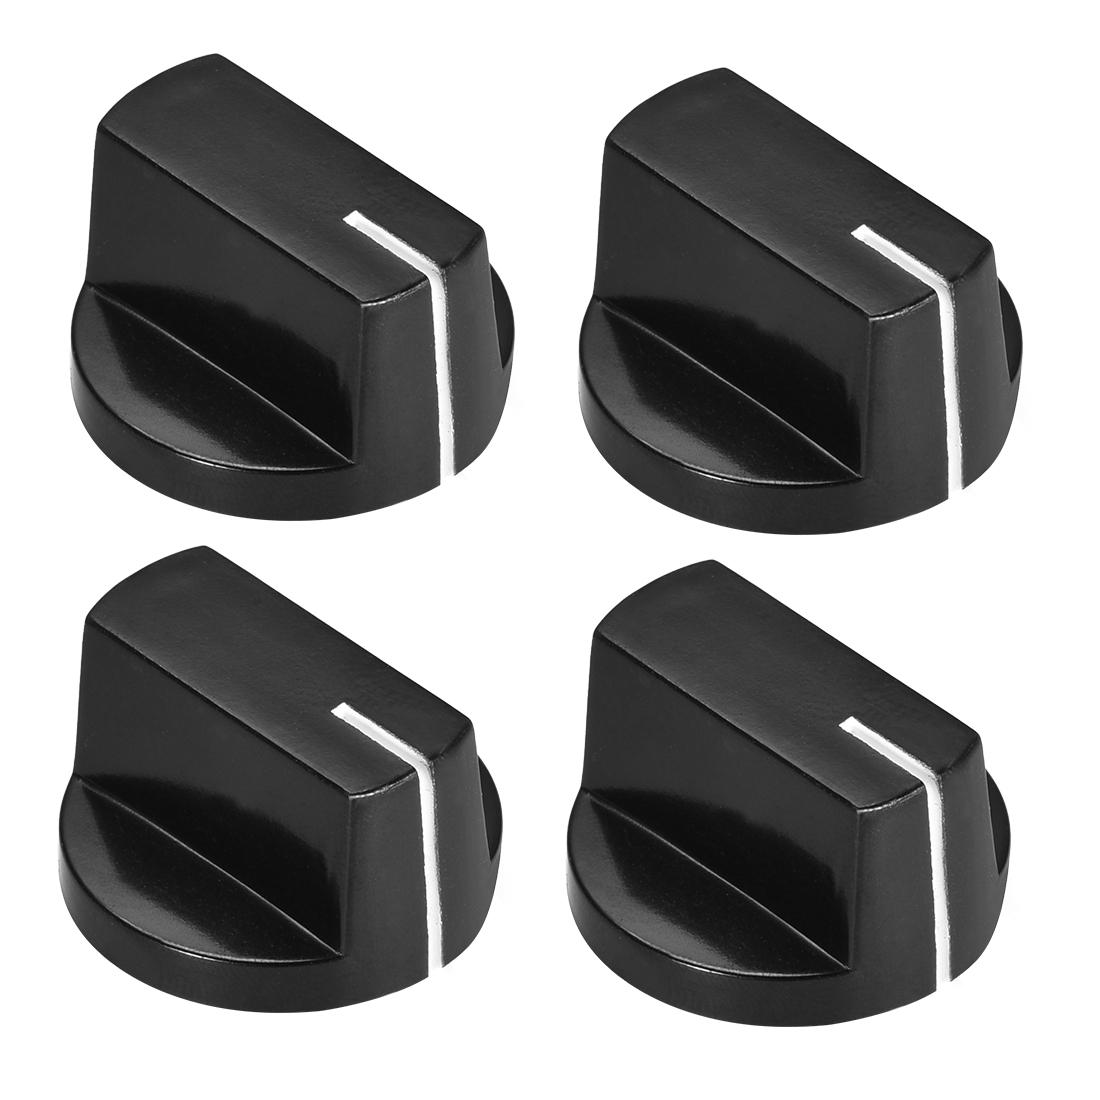 4pcs, 6mm Potentiometer Control Knobs For Guitar Acrylic Volume Tone Knobs Black